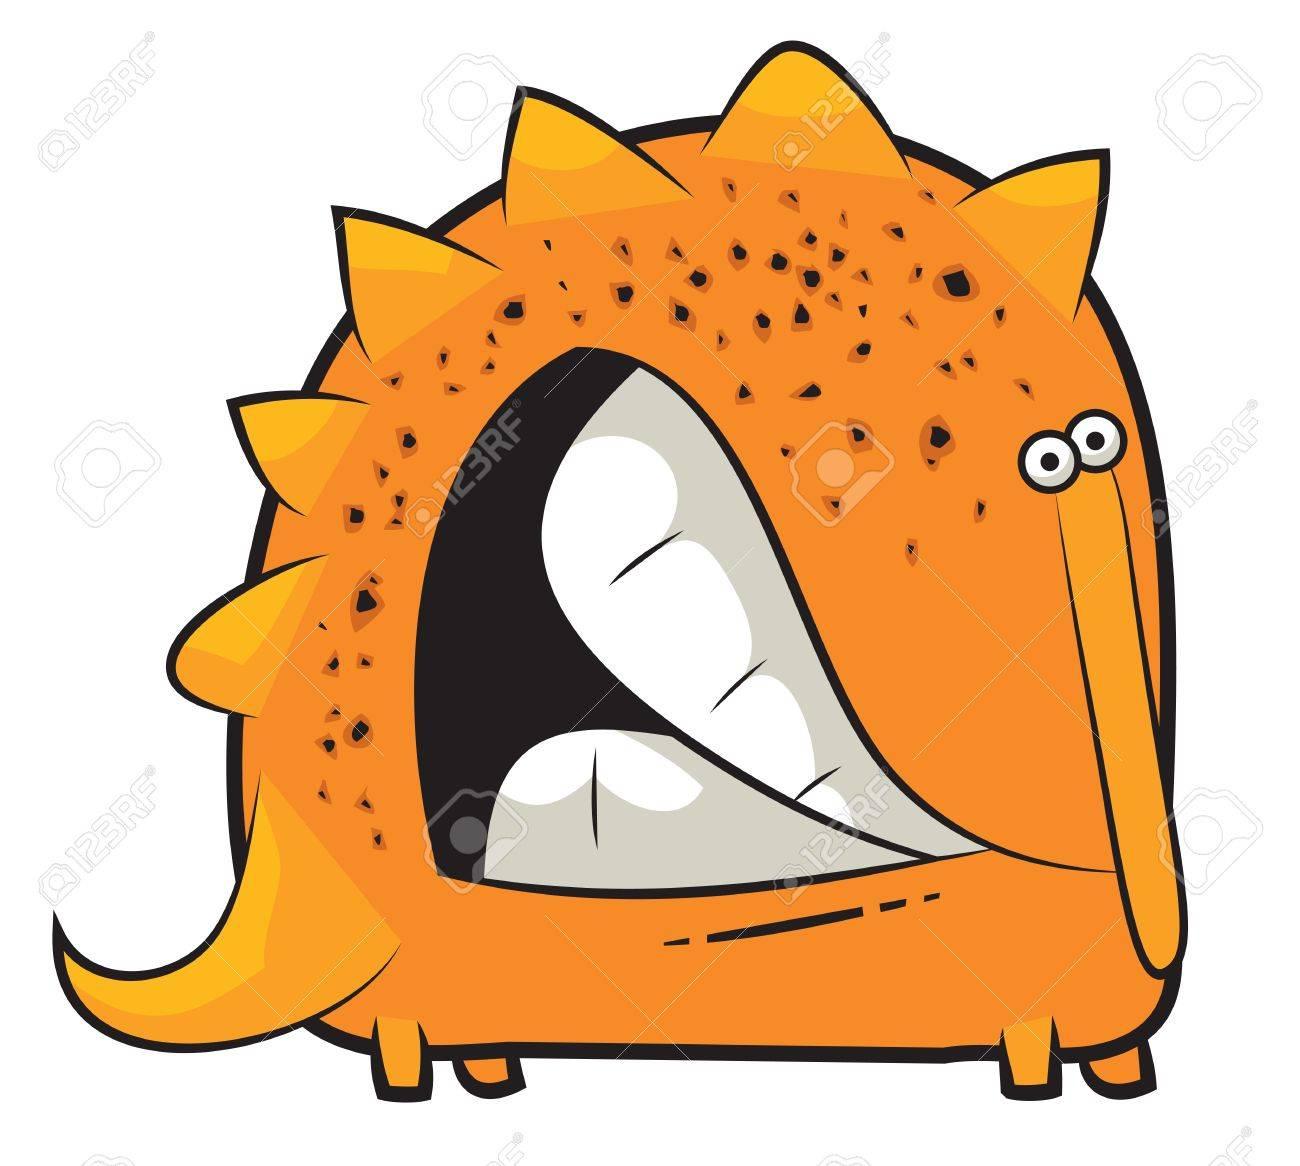 Teeth Chomping GIF - Teeth Chomping Cartoon - Discover & Share GIFs